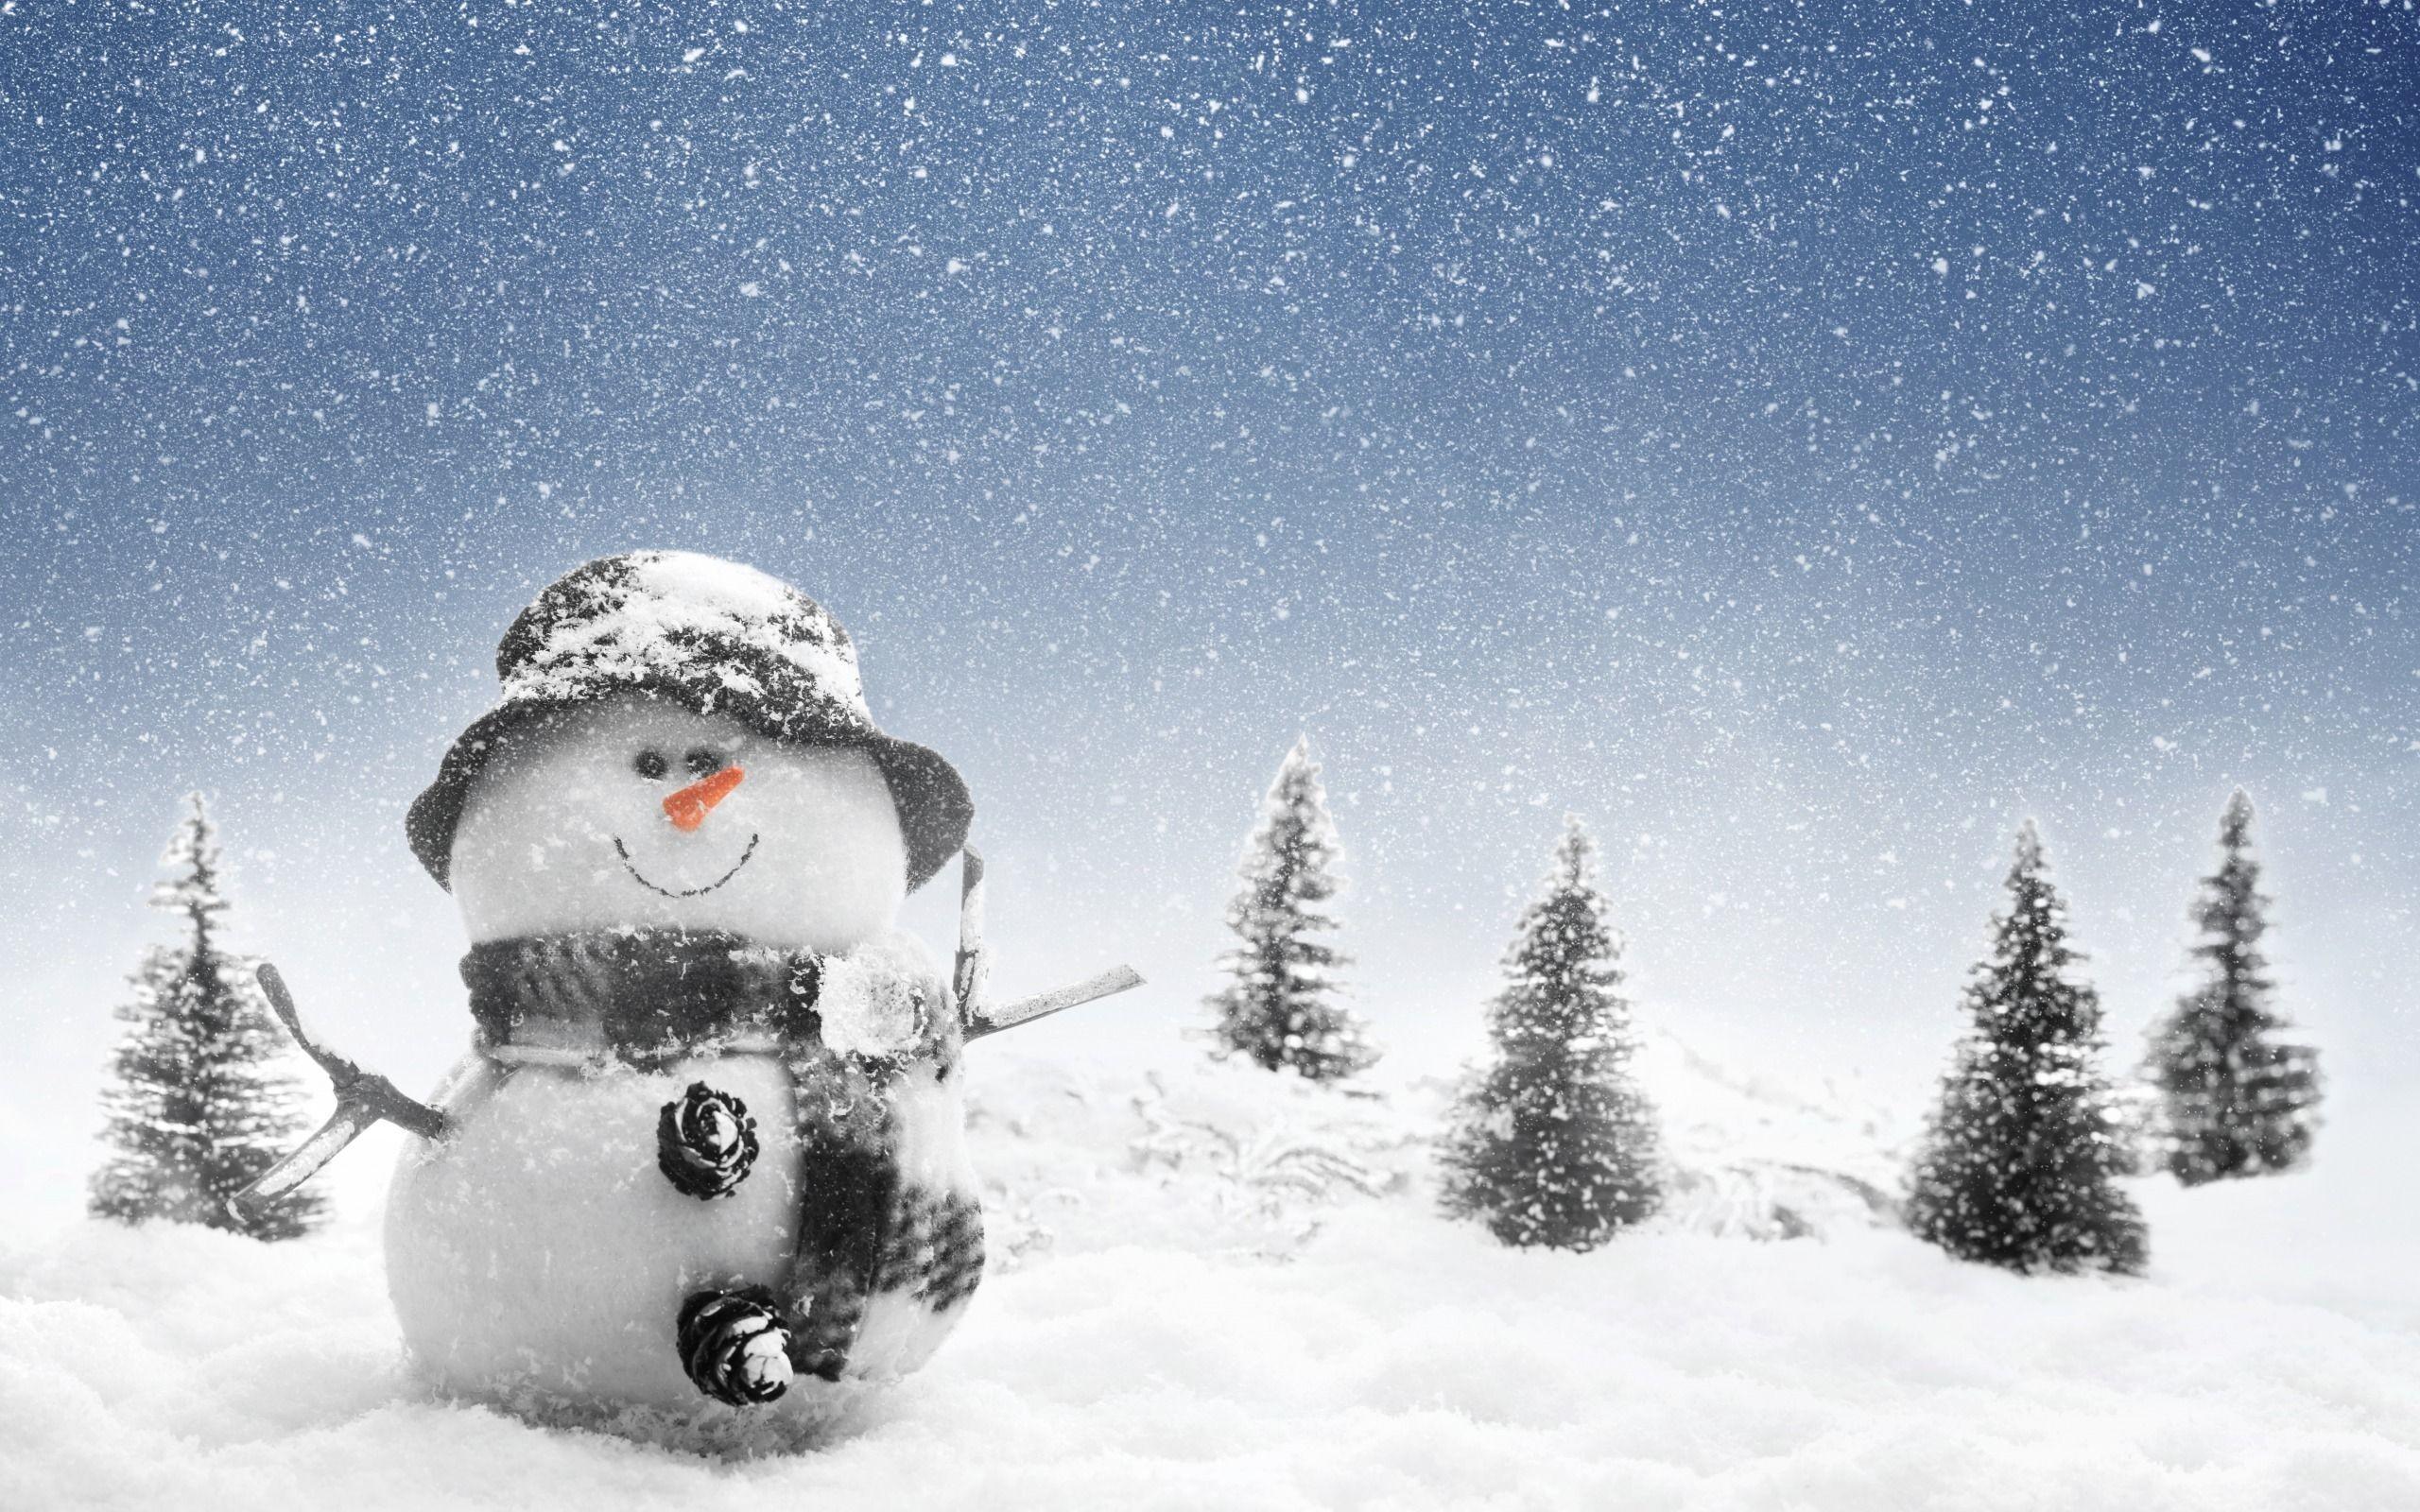 68 Snowman Desktop Wallpapers on WallpaperPlay 2560x1600